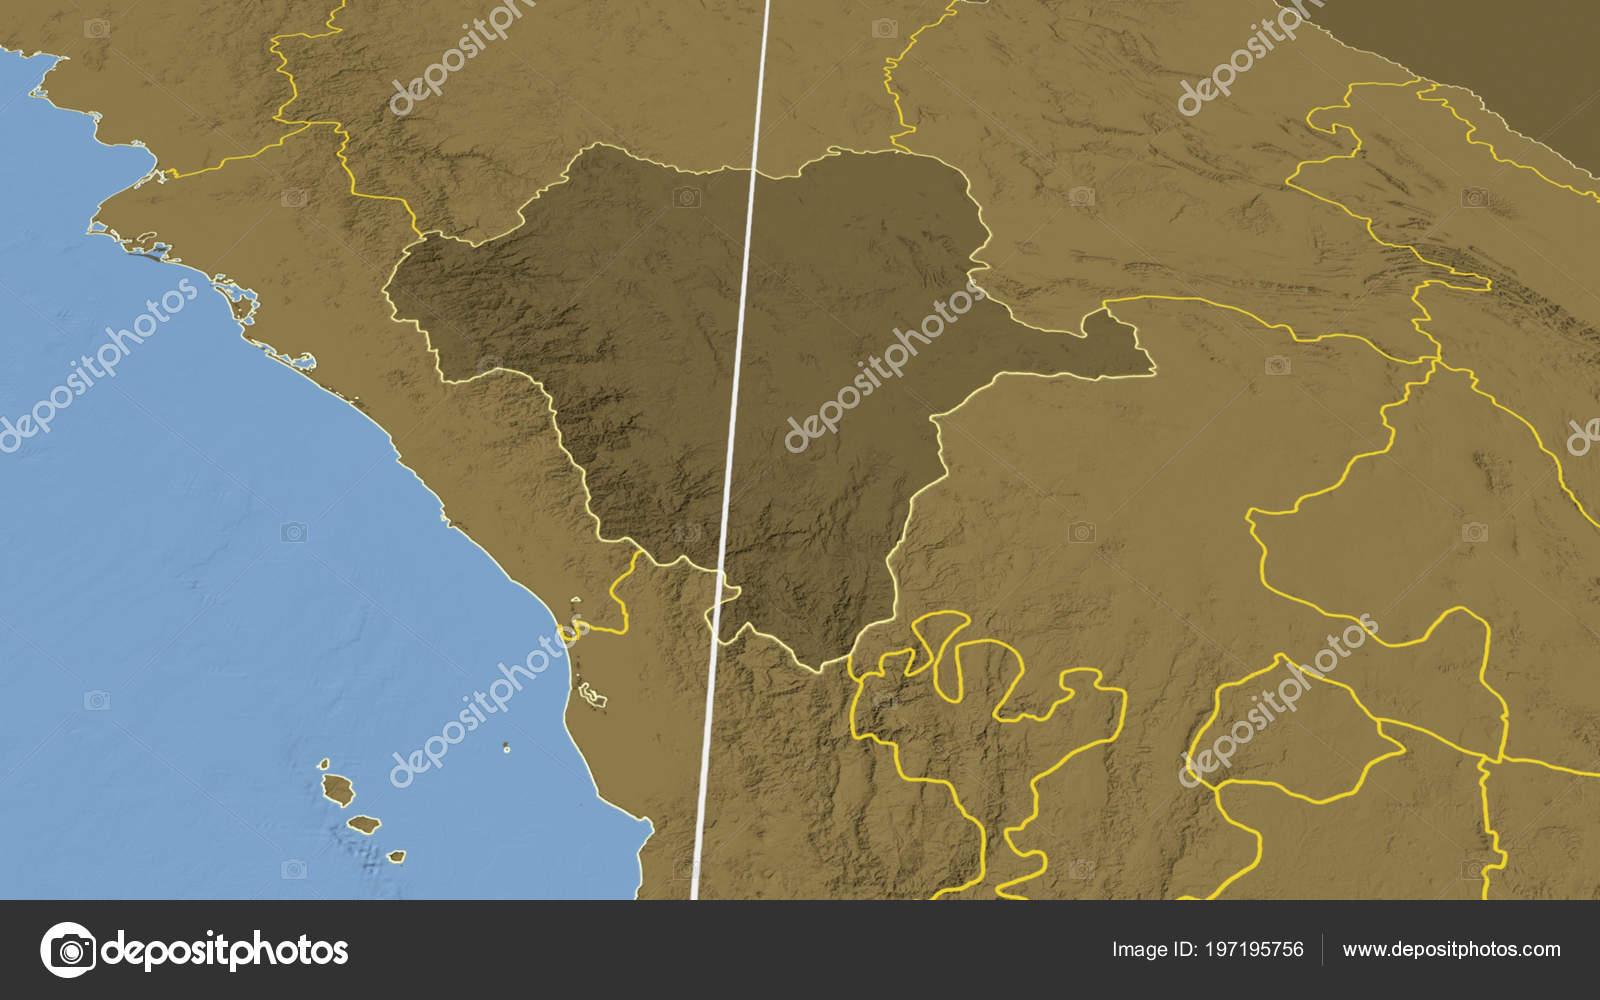 Durango Region Mexico Outlined Bilevel Elevation Map — Stock Photo ...